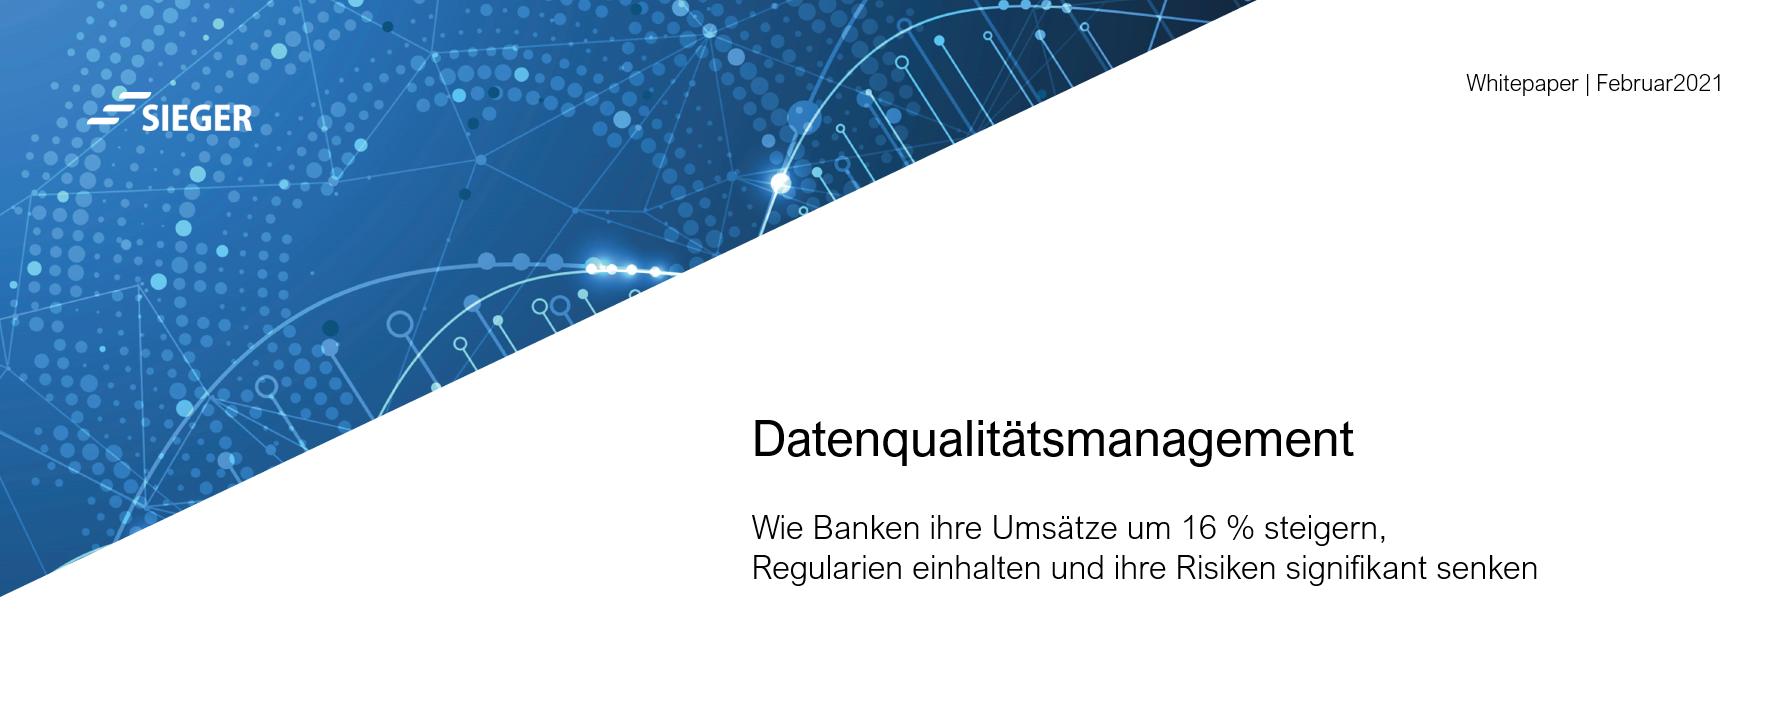 Datenqulitätsmanagement